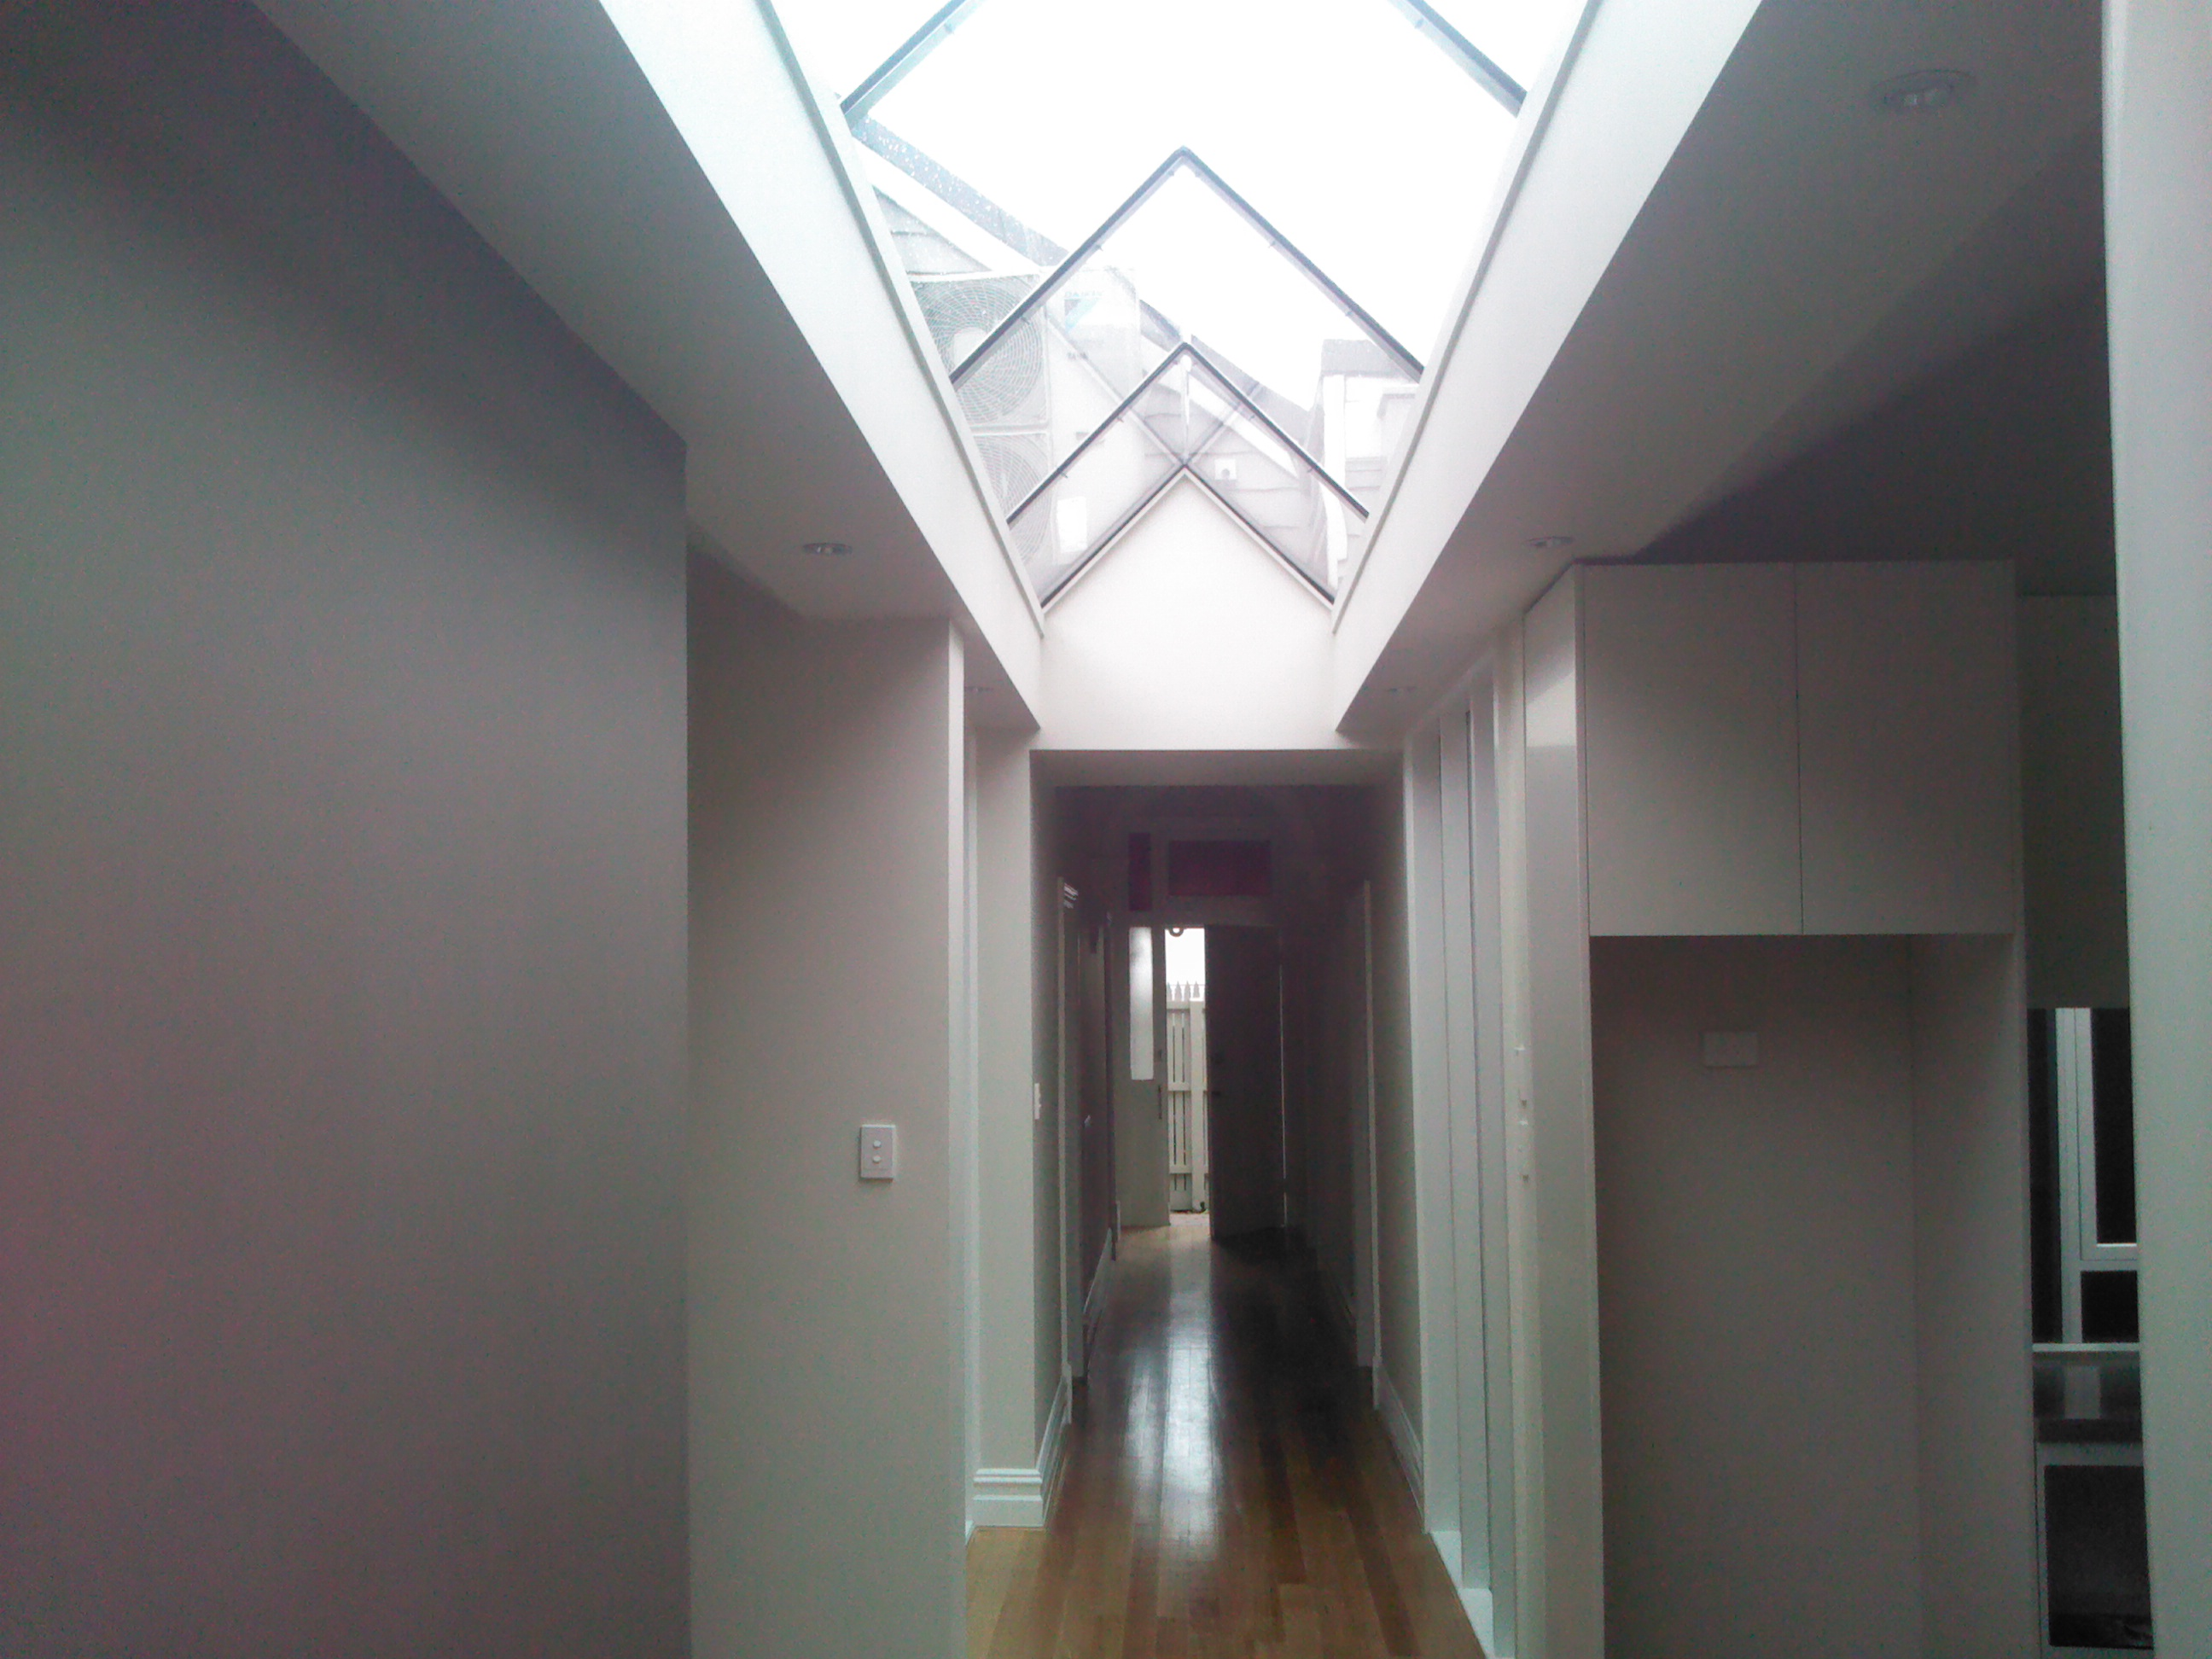 Atrium ceiling-South Yarra Renovation-South Yarra Renovation